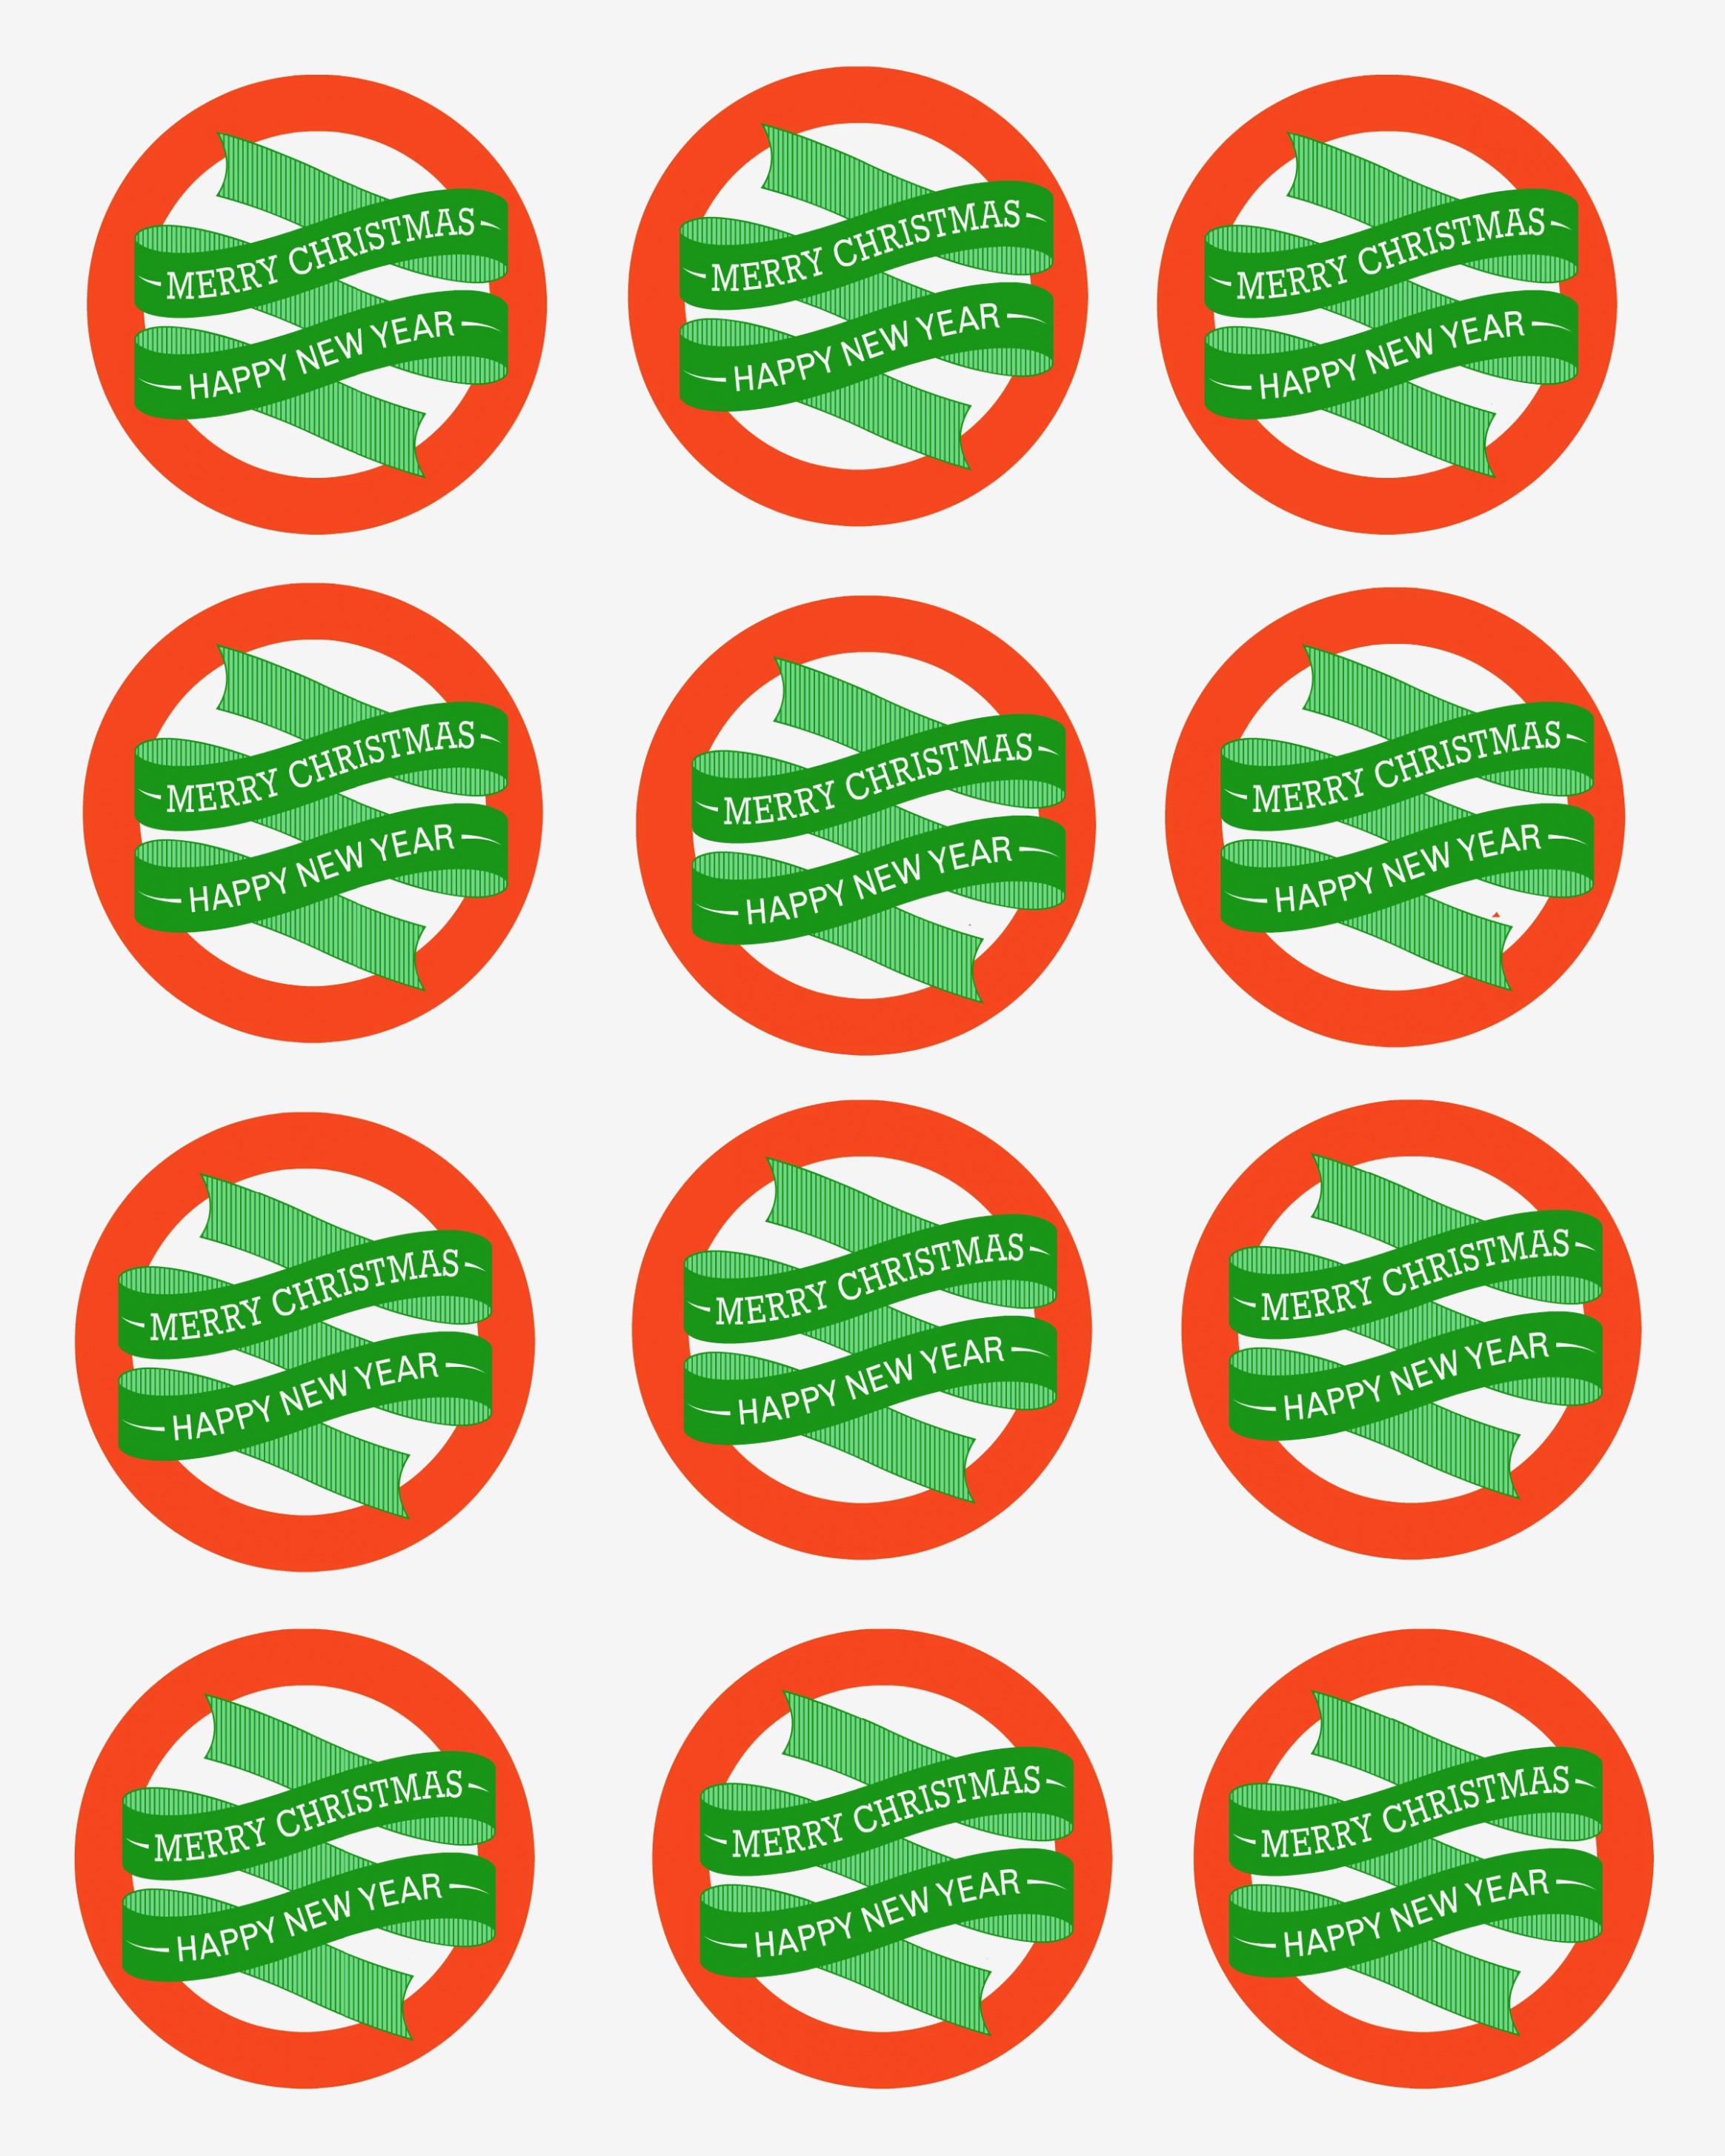 Free Printable Mason Jar Gift Labels – Merry Christmas – Free Mason - Free Printable Jar Label Templates